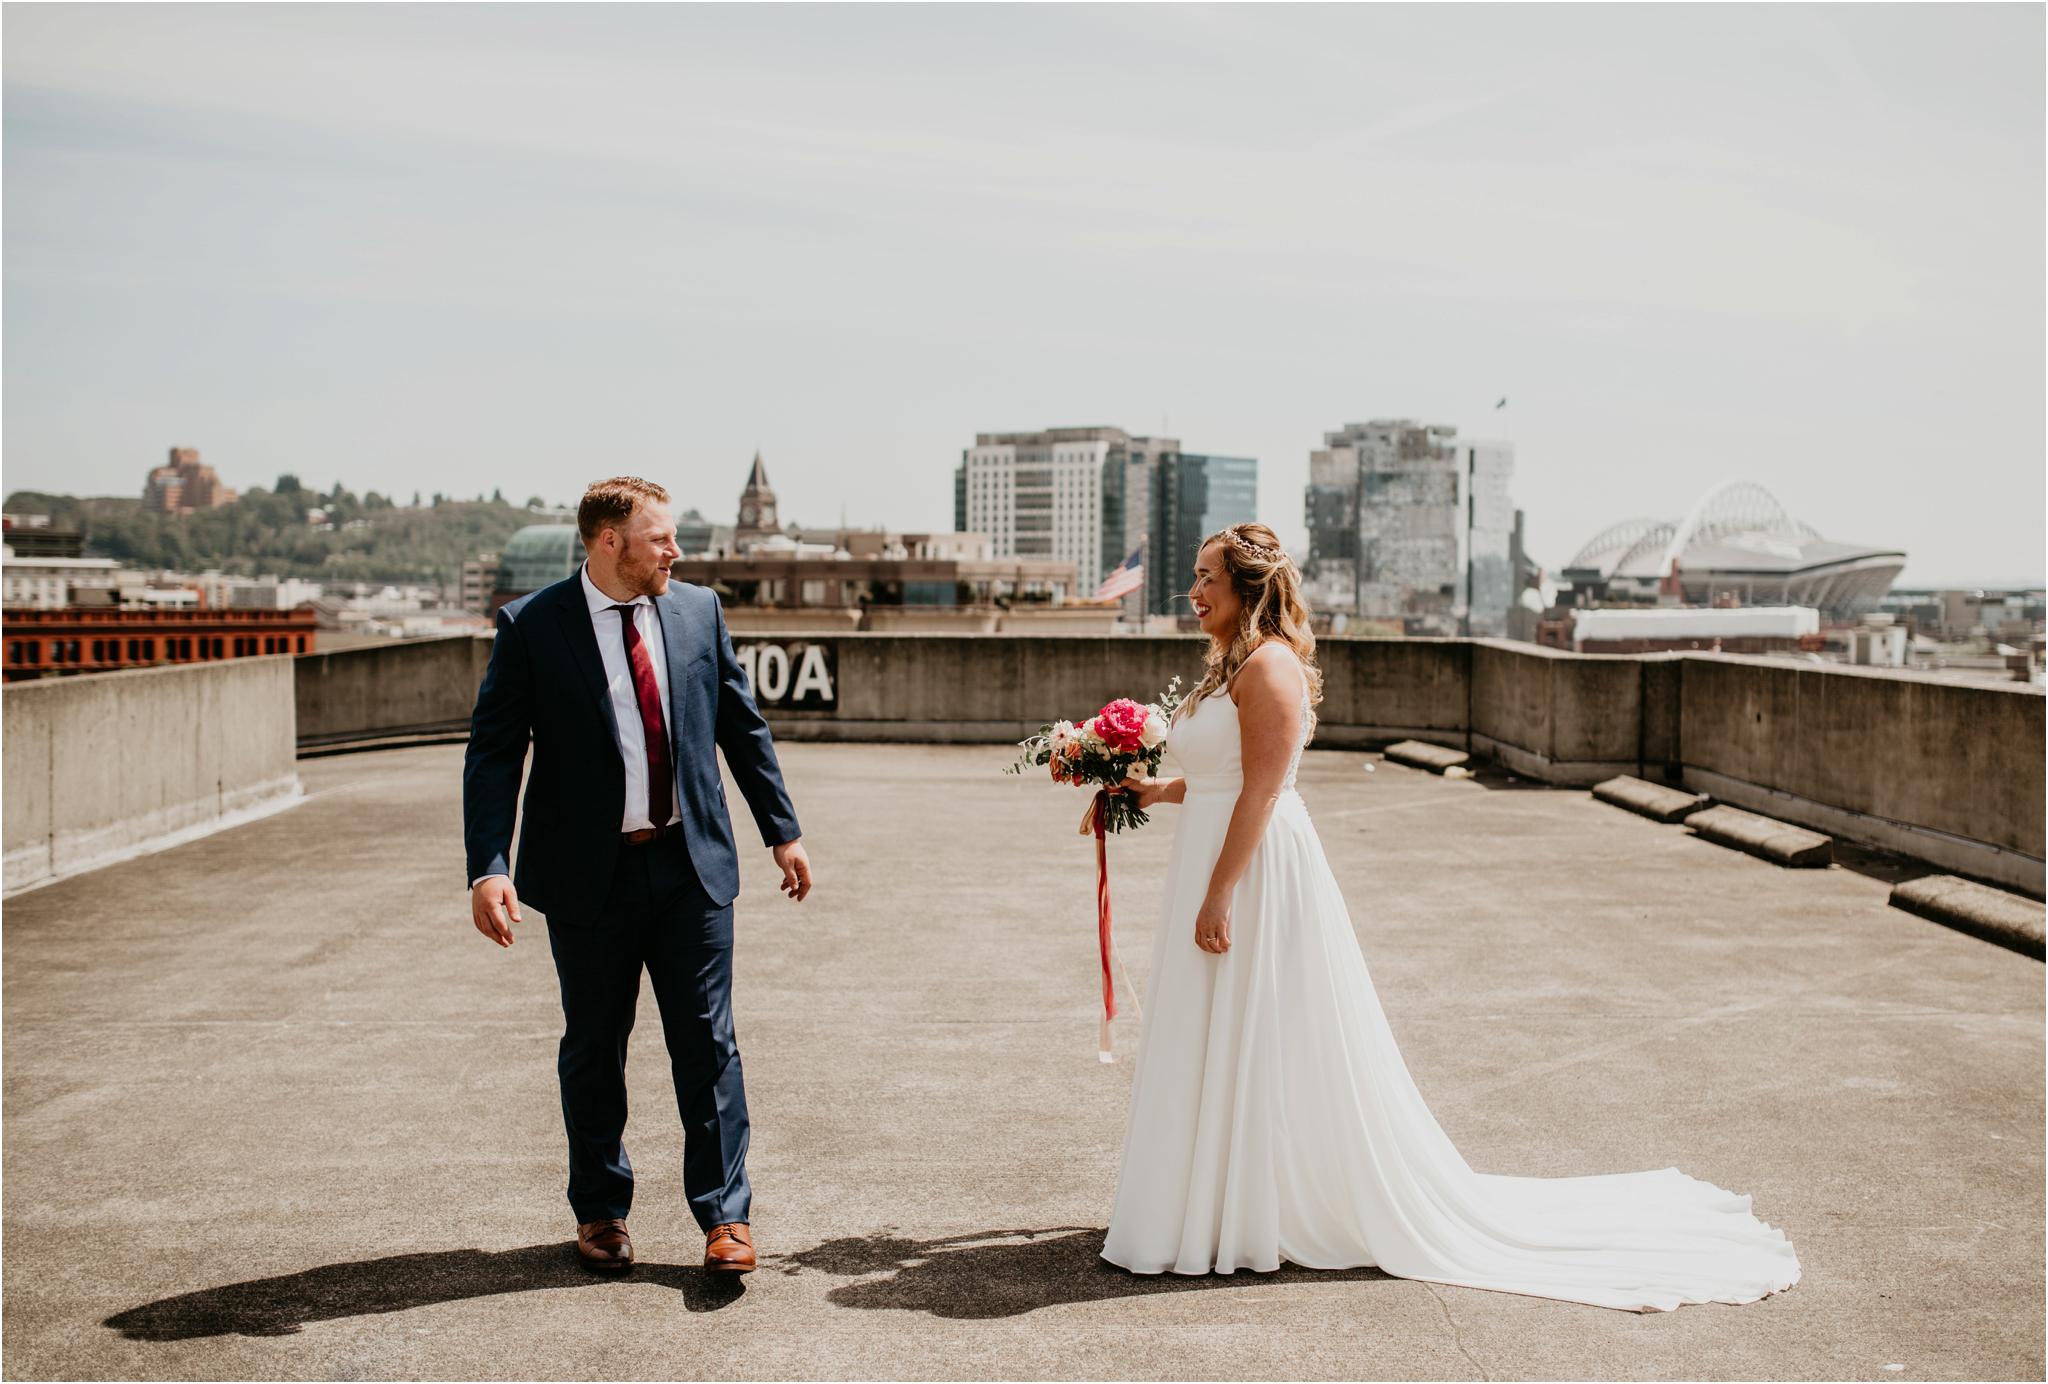 laura-and-matt-metropolist-urban-seattle-wedding-photographer-035.jpg